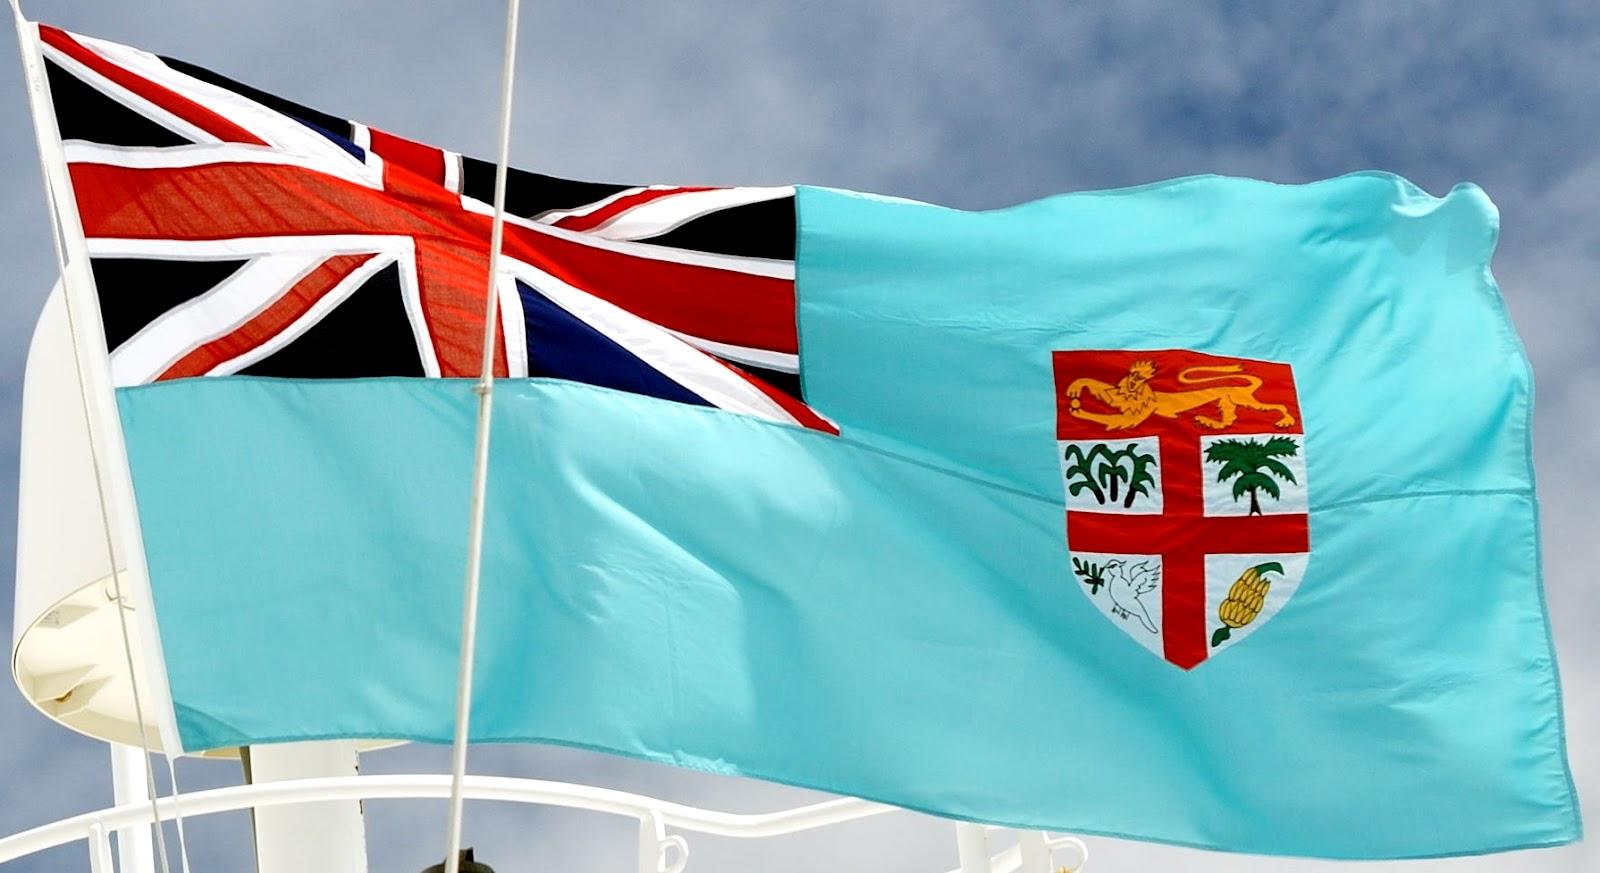 http://1.bp.blogspot.com/-HGoRz56D92o/ULQM-XizQ3I/AAAAAAAAEP4/YyGVMKWZ7fw/s1600/Flag+of+Fiji+Fijian+national+flag+(1).jpg